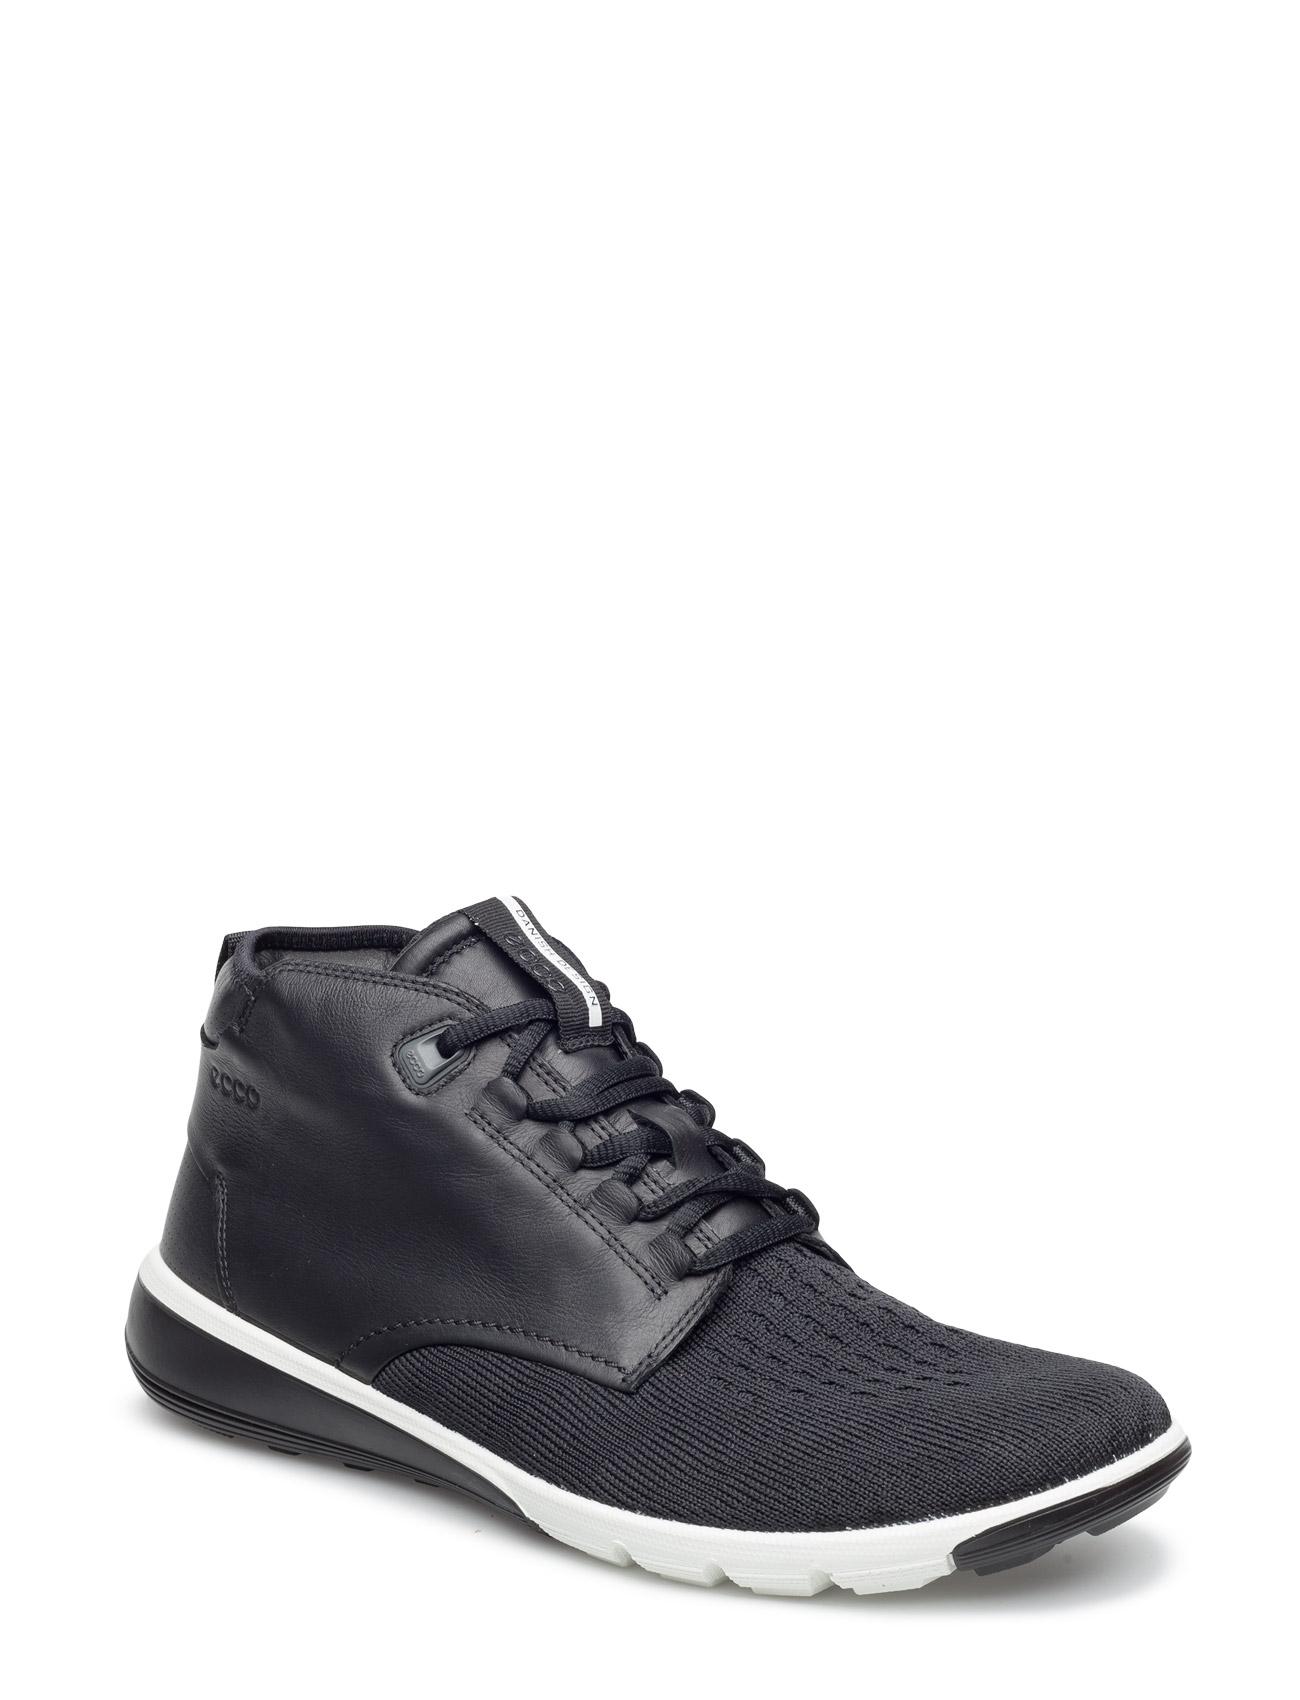 Intrinsic 2 Men'S ECCO Sneakers til Herrer i